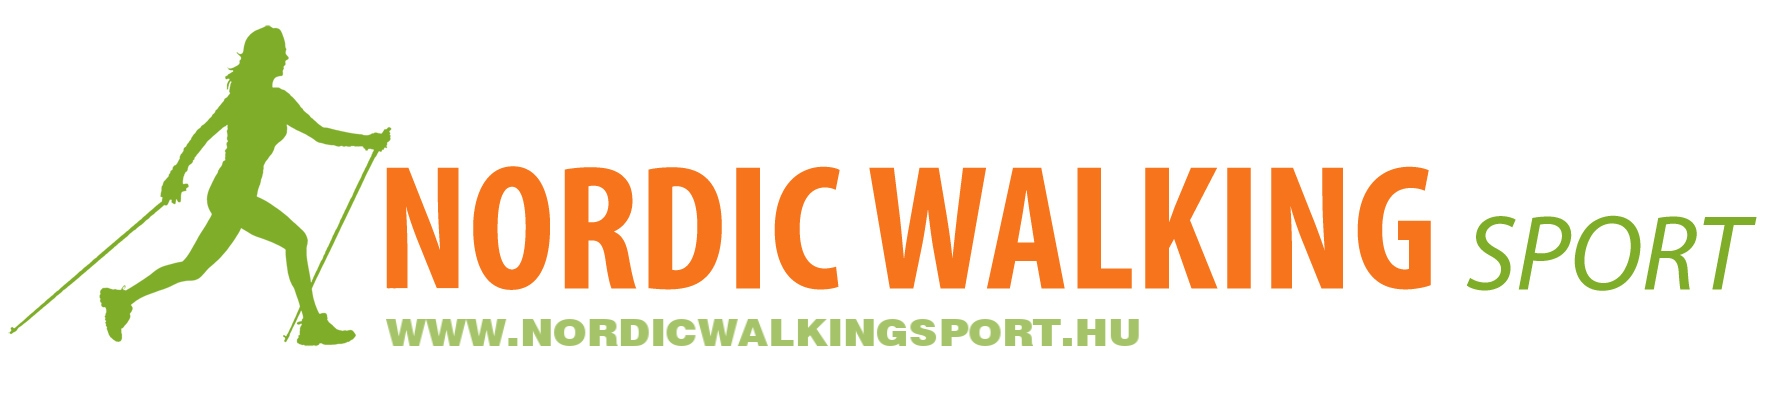 Nordic Walking Sport